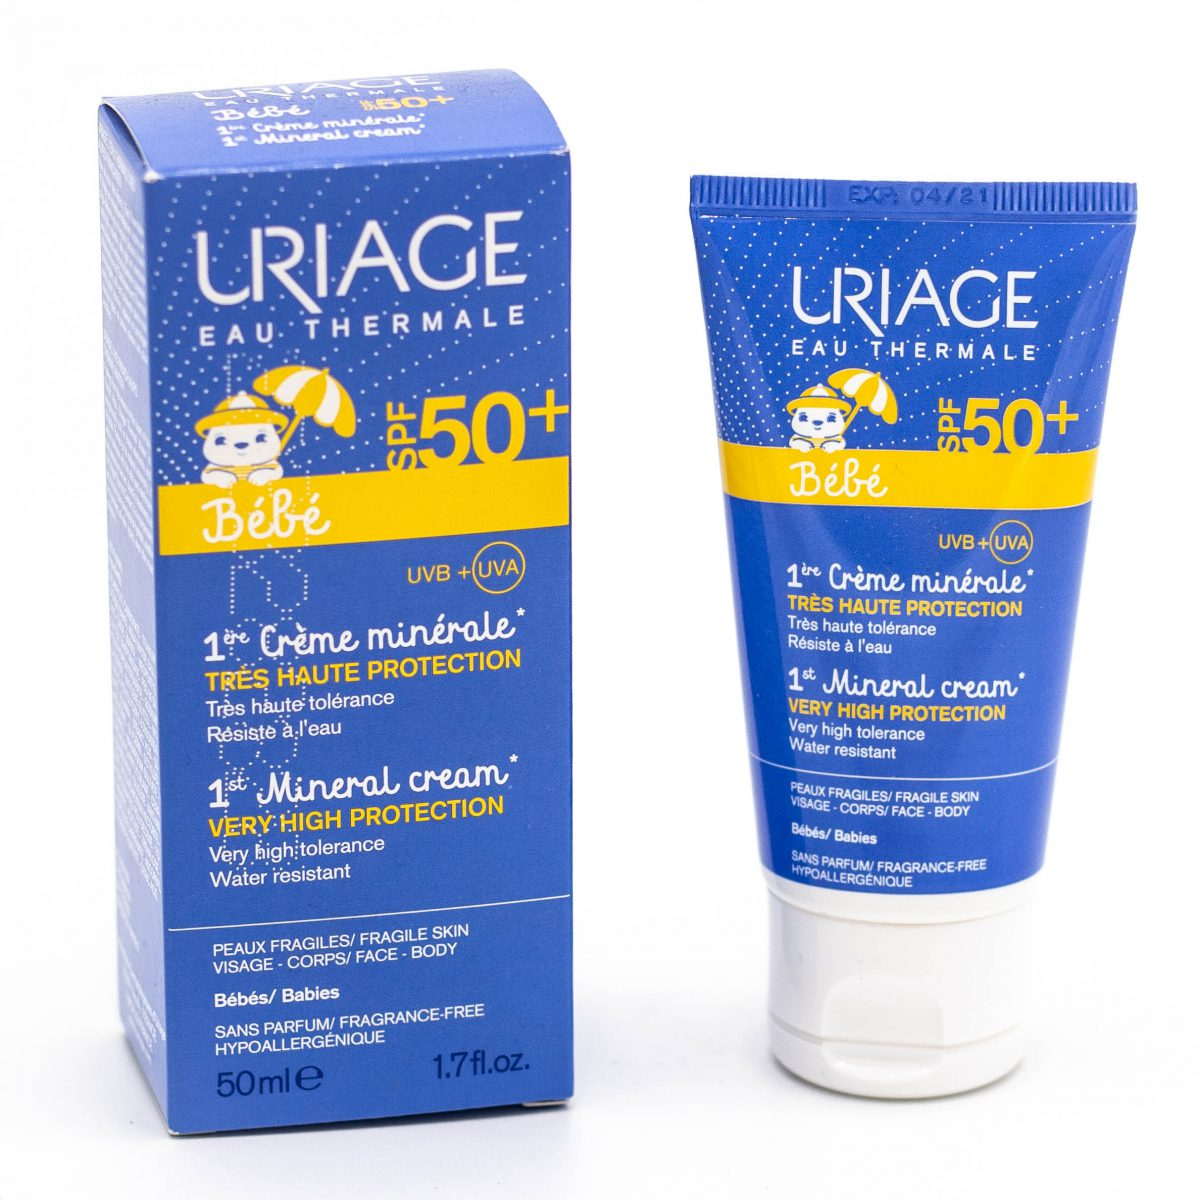 اولین کرم ضد آفتاب مینرال اوریاژ SPF50 حجم 50 میلی لیتری Uriage